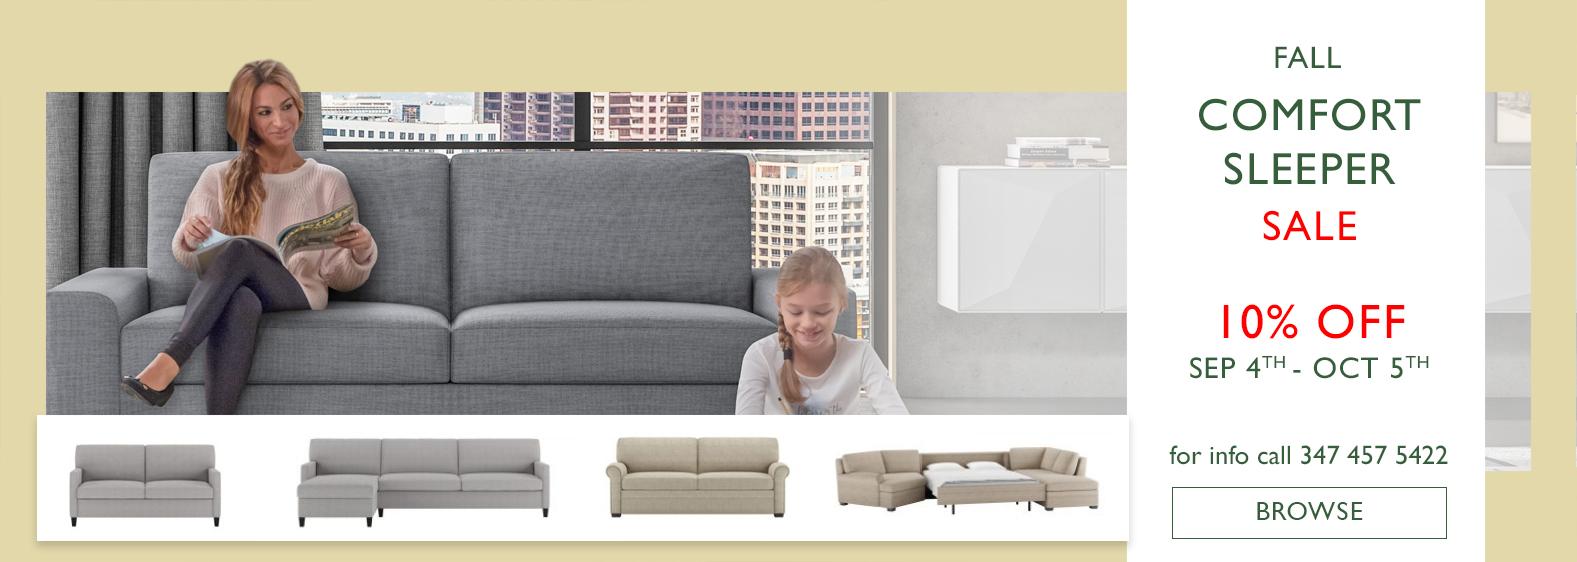 Fall Comfort Sleeper Sale Sep - Oct 2020